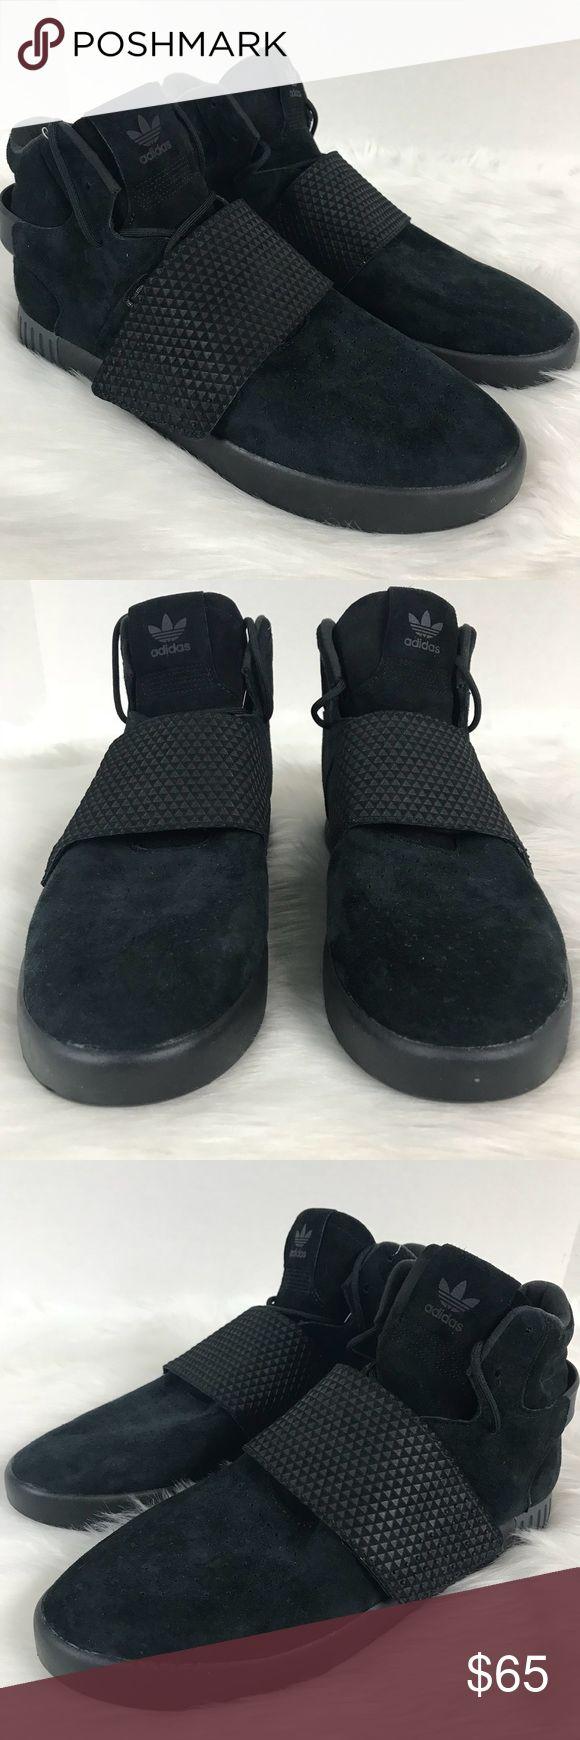 adidas courroie tubulaire triple en daim noir taille adidas originaux originaux adidas 0d3c36